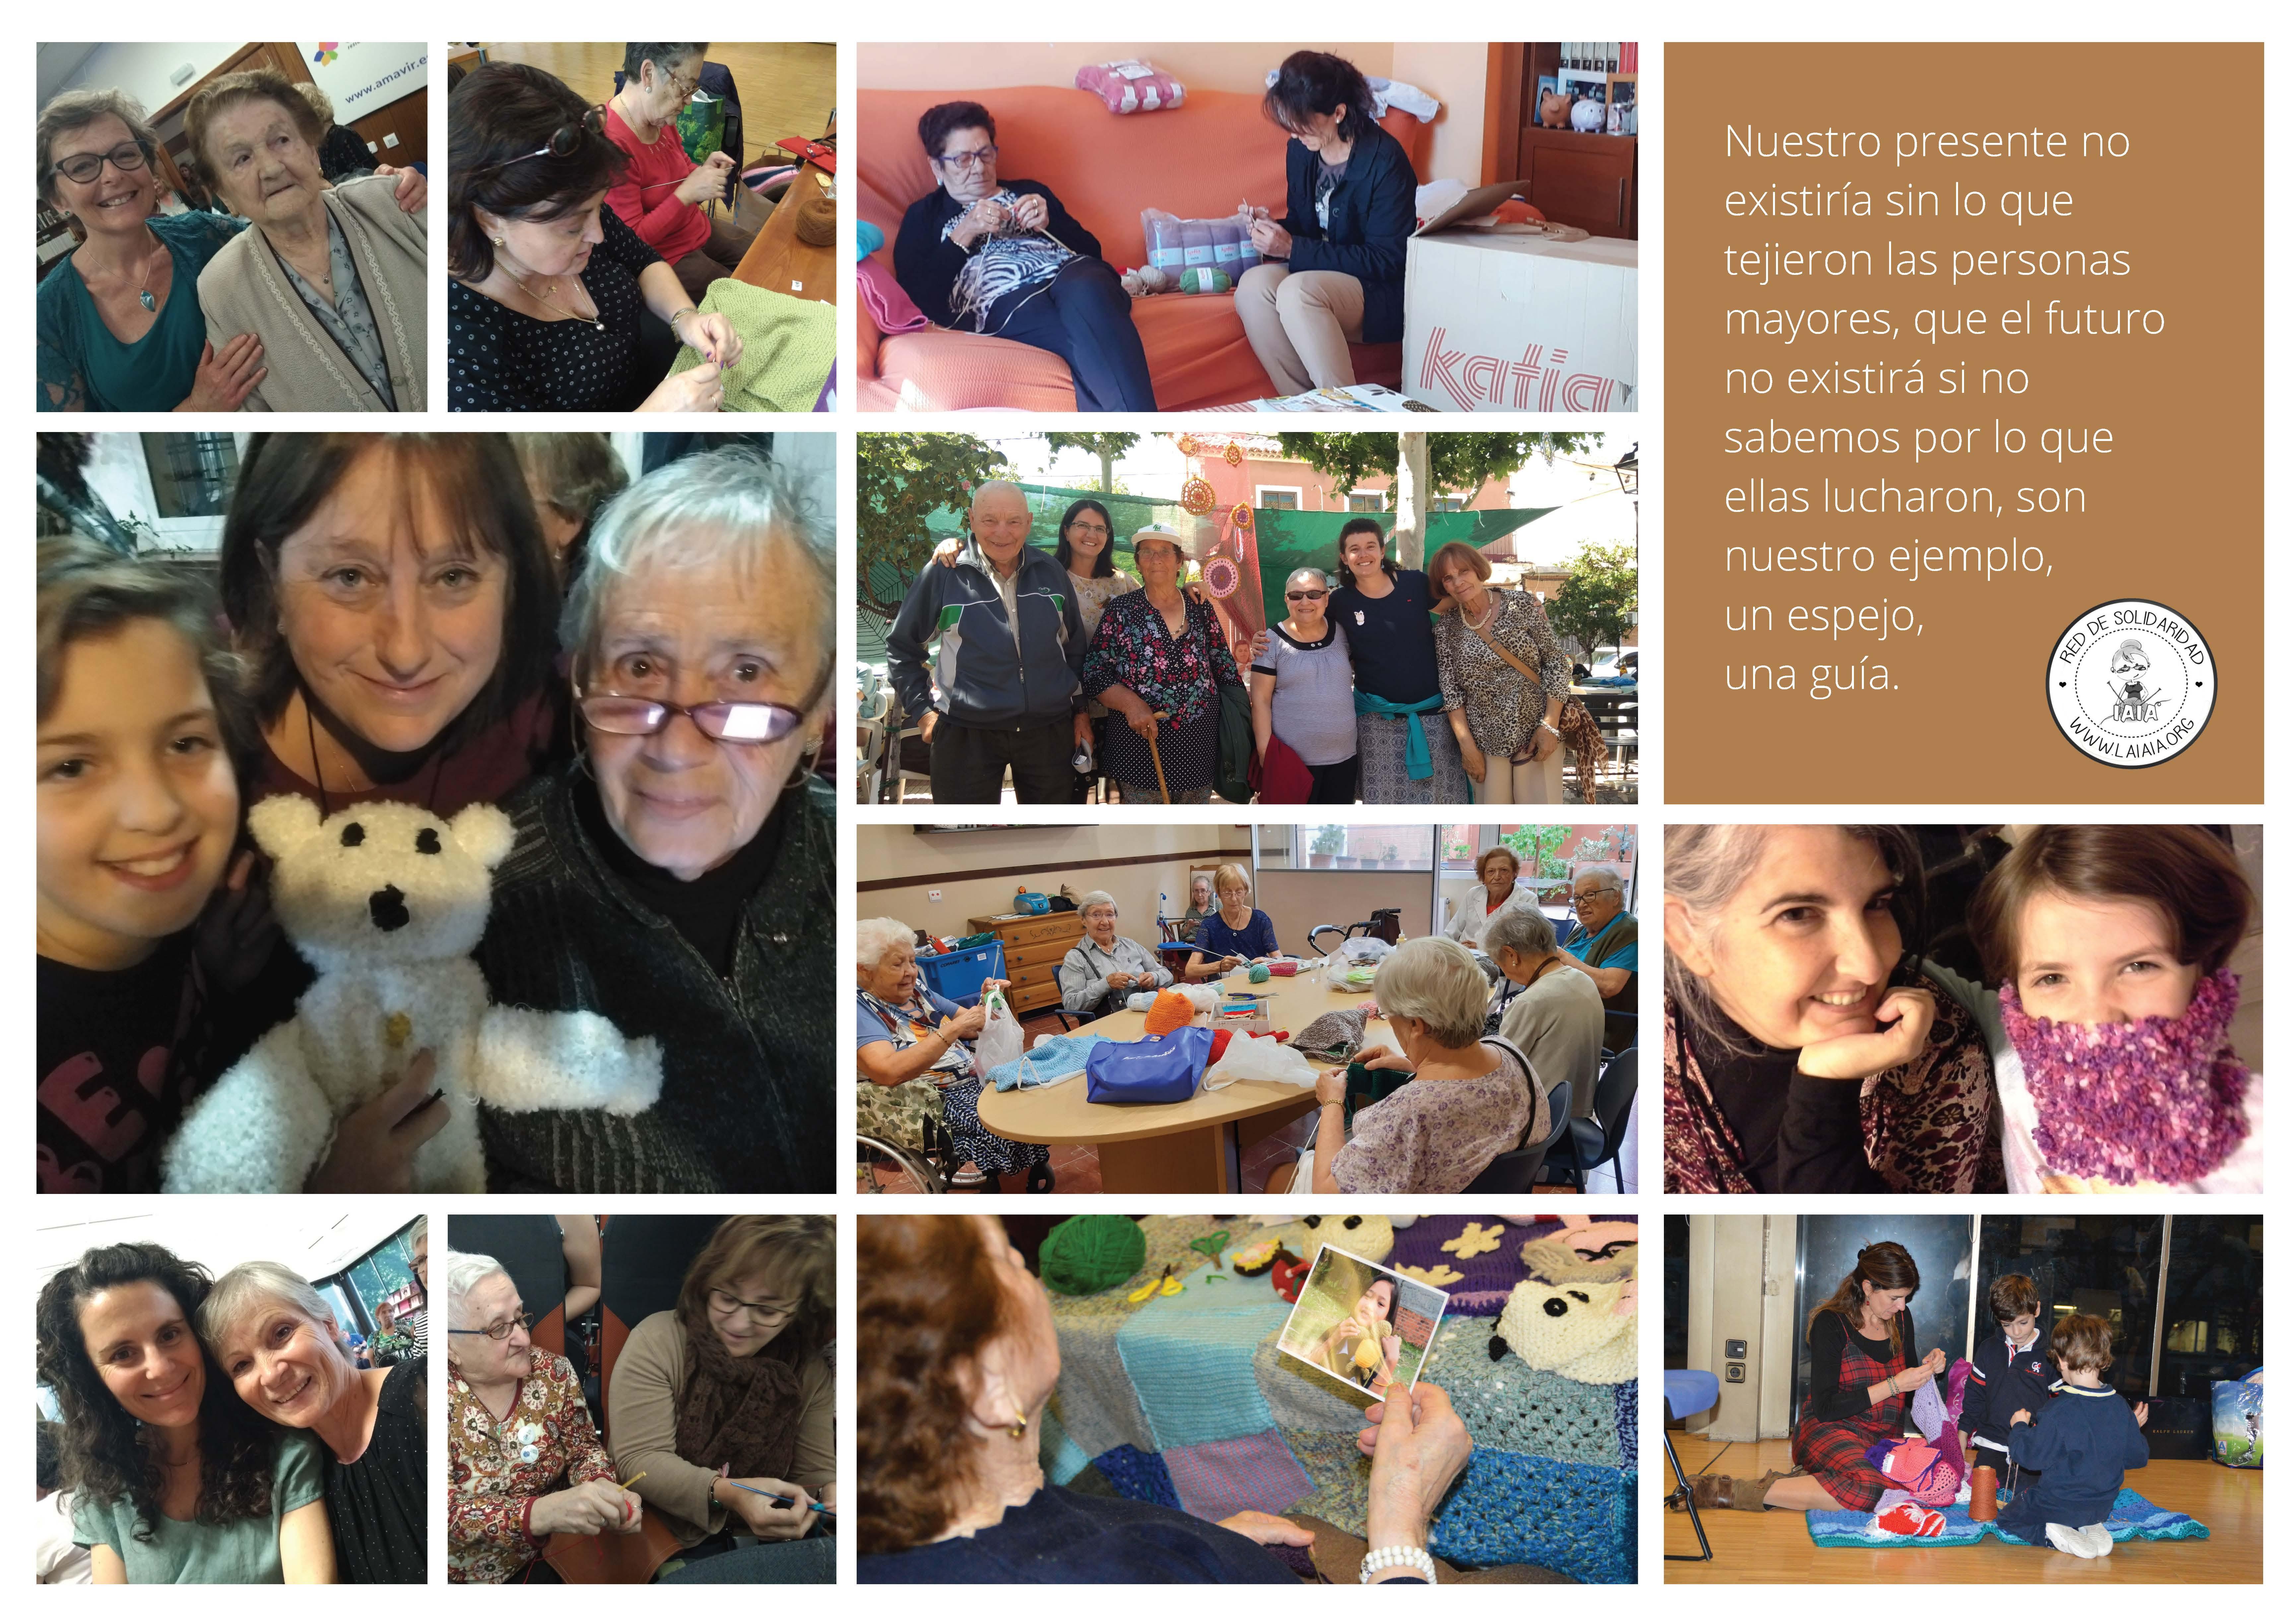 Hilfsprojekte-Spende-(d)ein-Knäuel-Katia-IAIA-Senioren